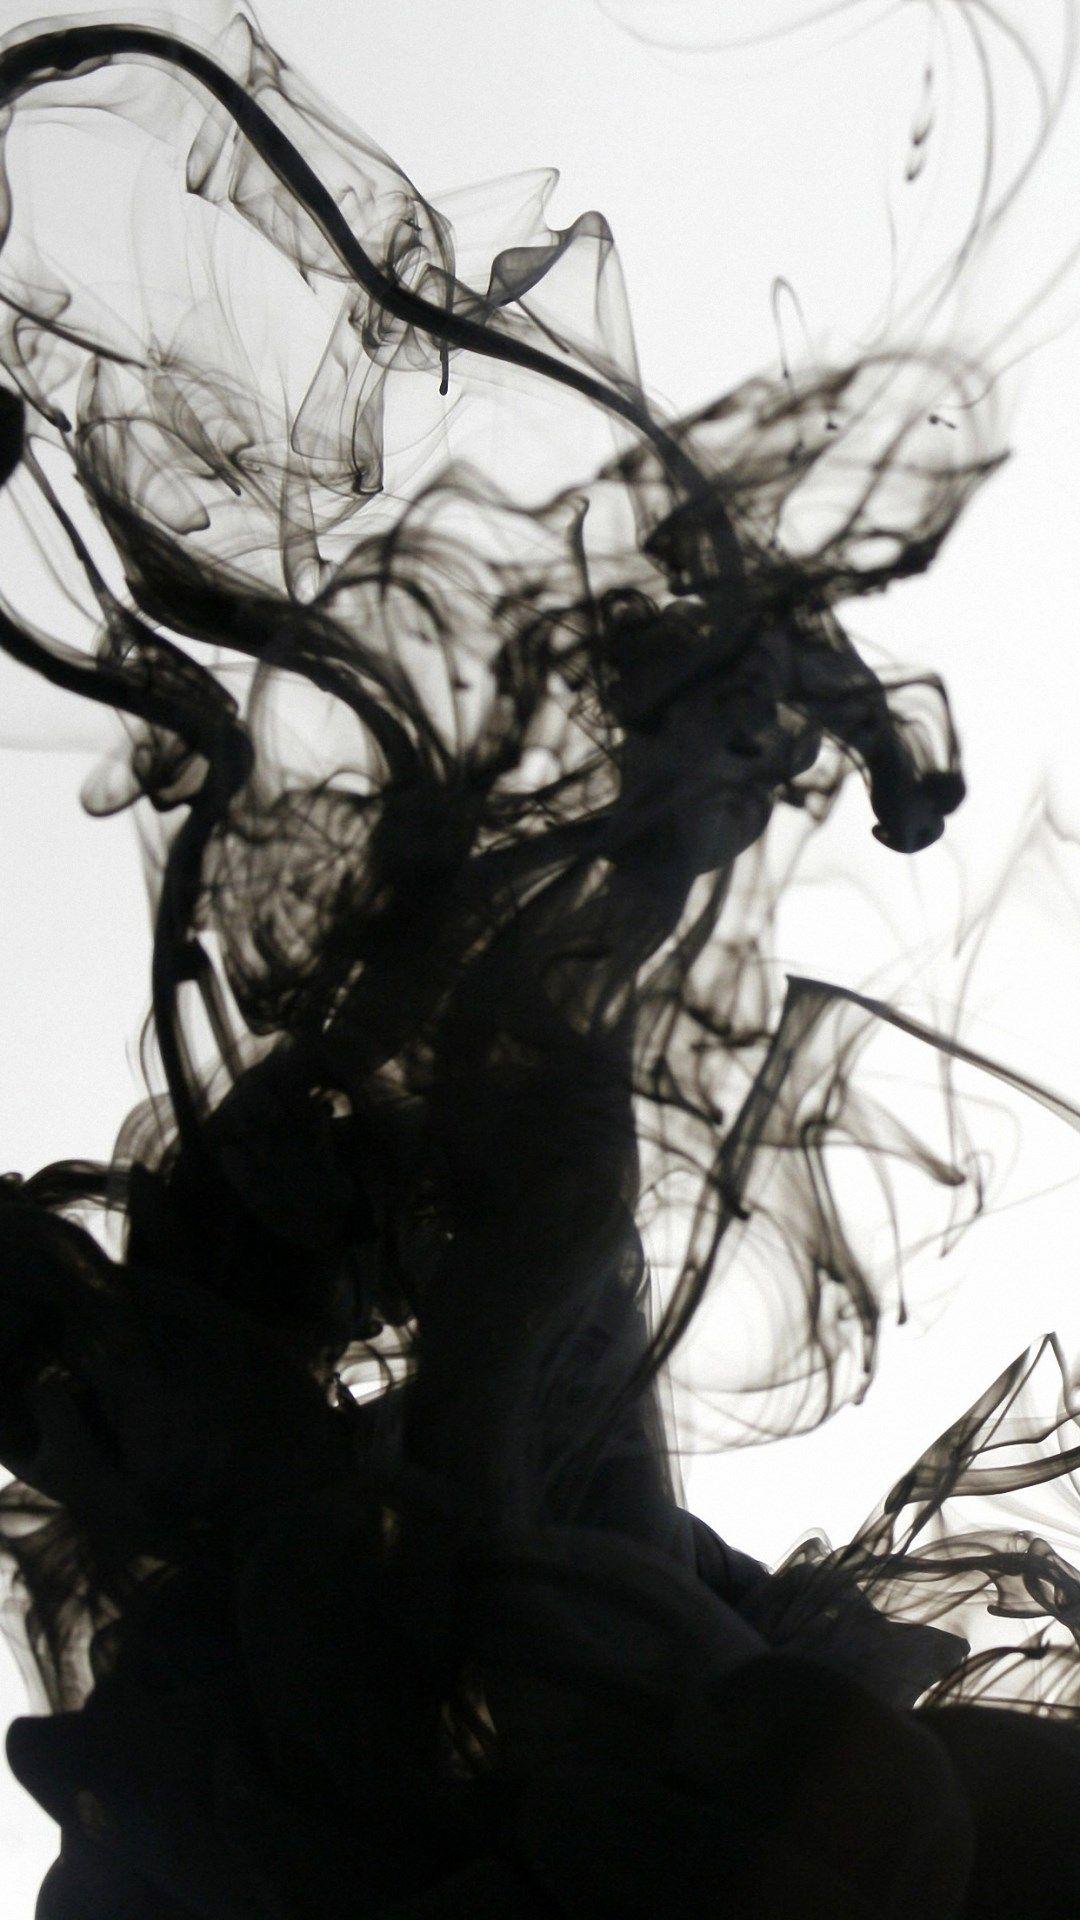 Dark Smoke Iphone Wallpaper October Wallpaper Halloween Wallpaper Black Wallpaper